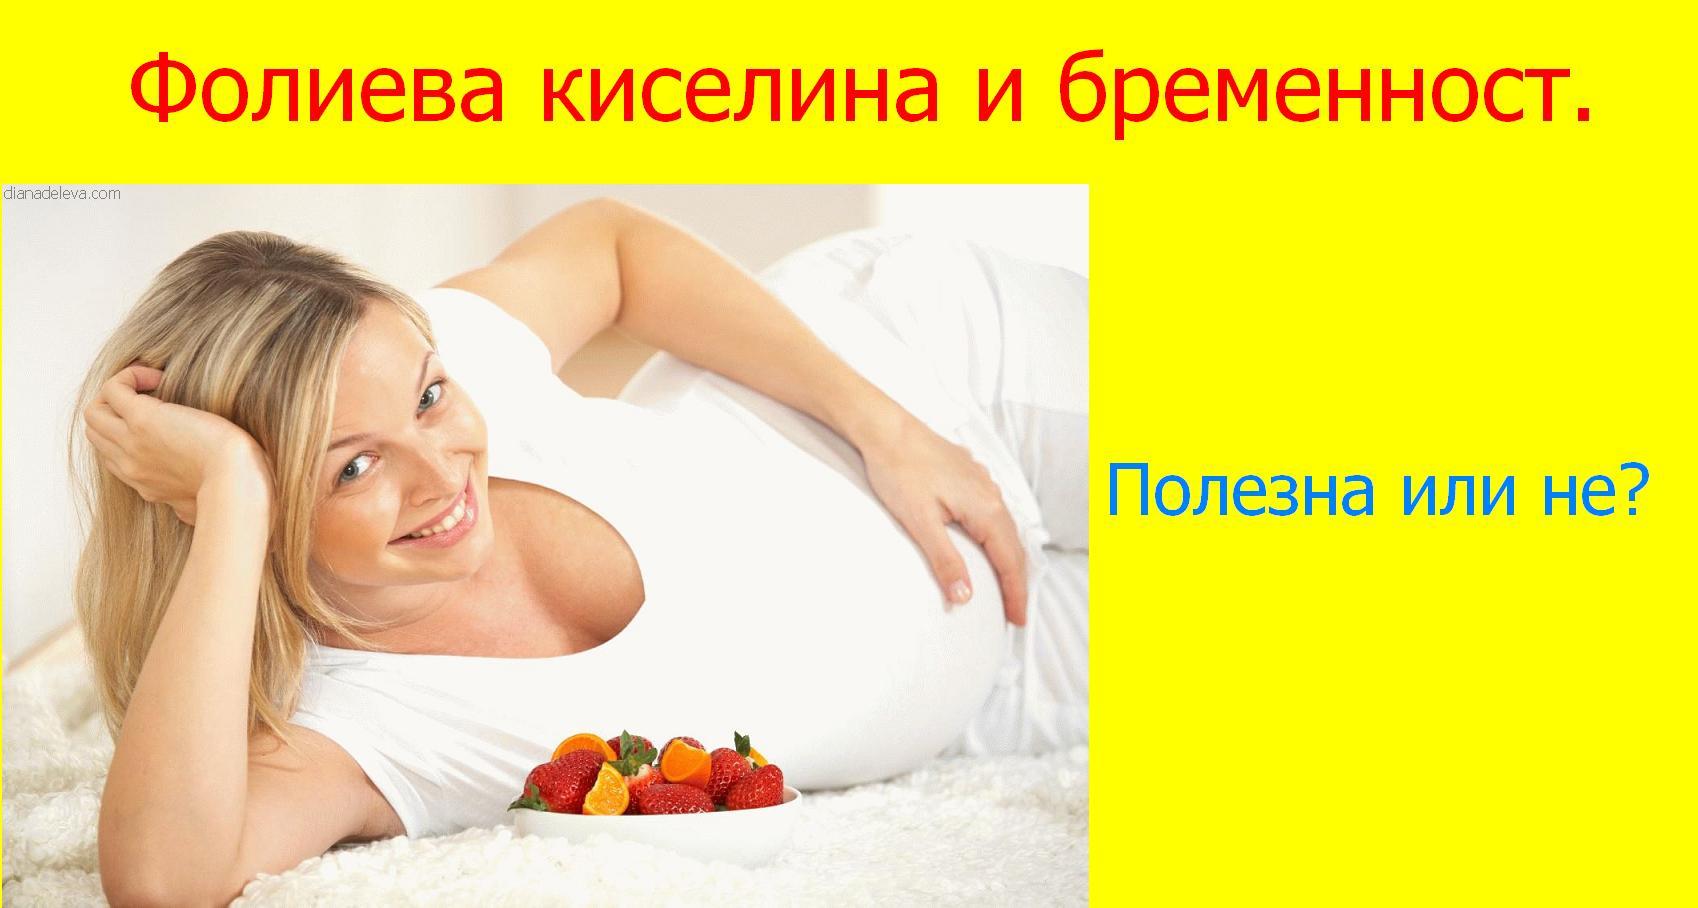 фолиева киселина и бременност раждане folieva kiselina polezna ili ne triabva li da se pie